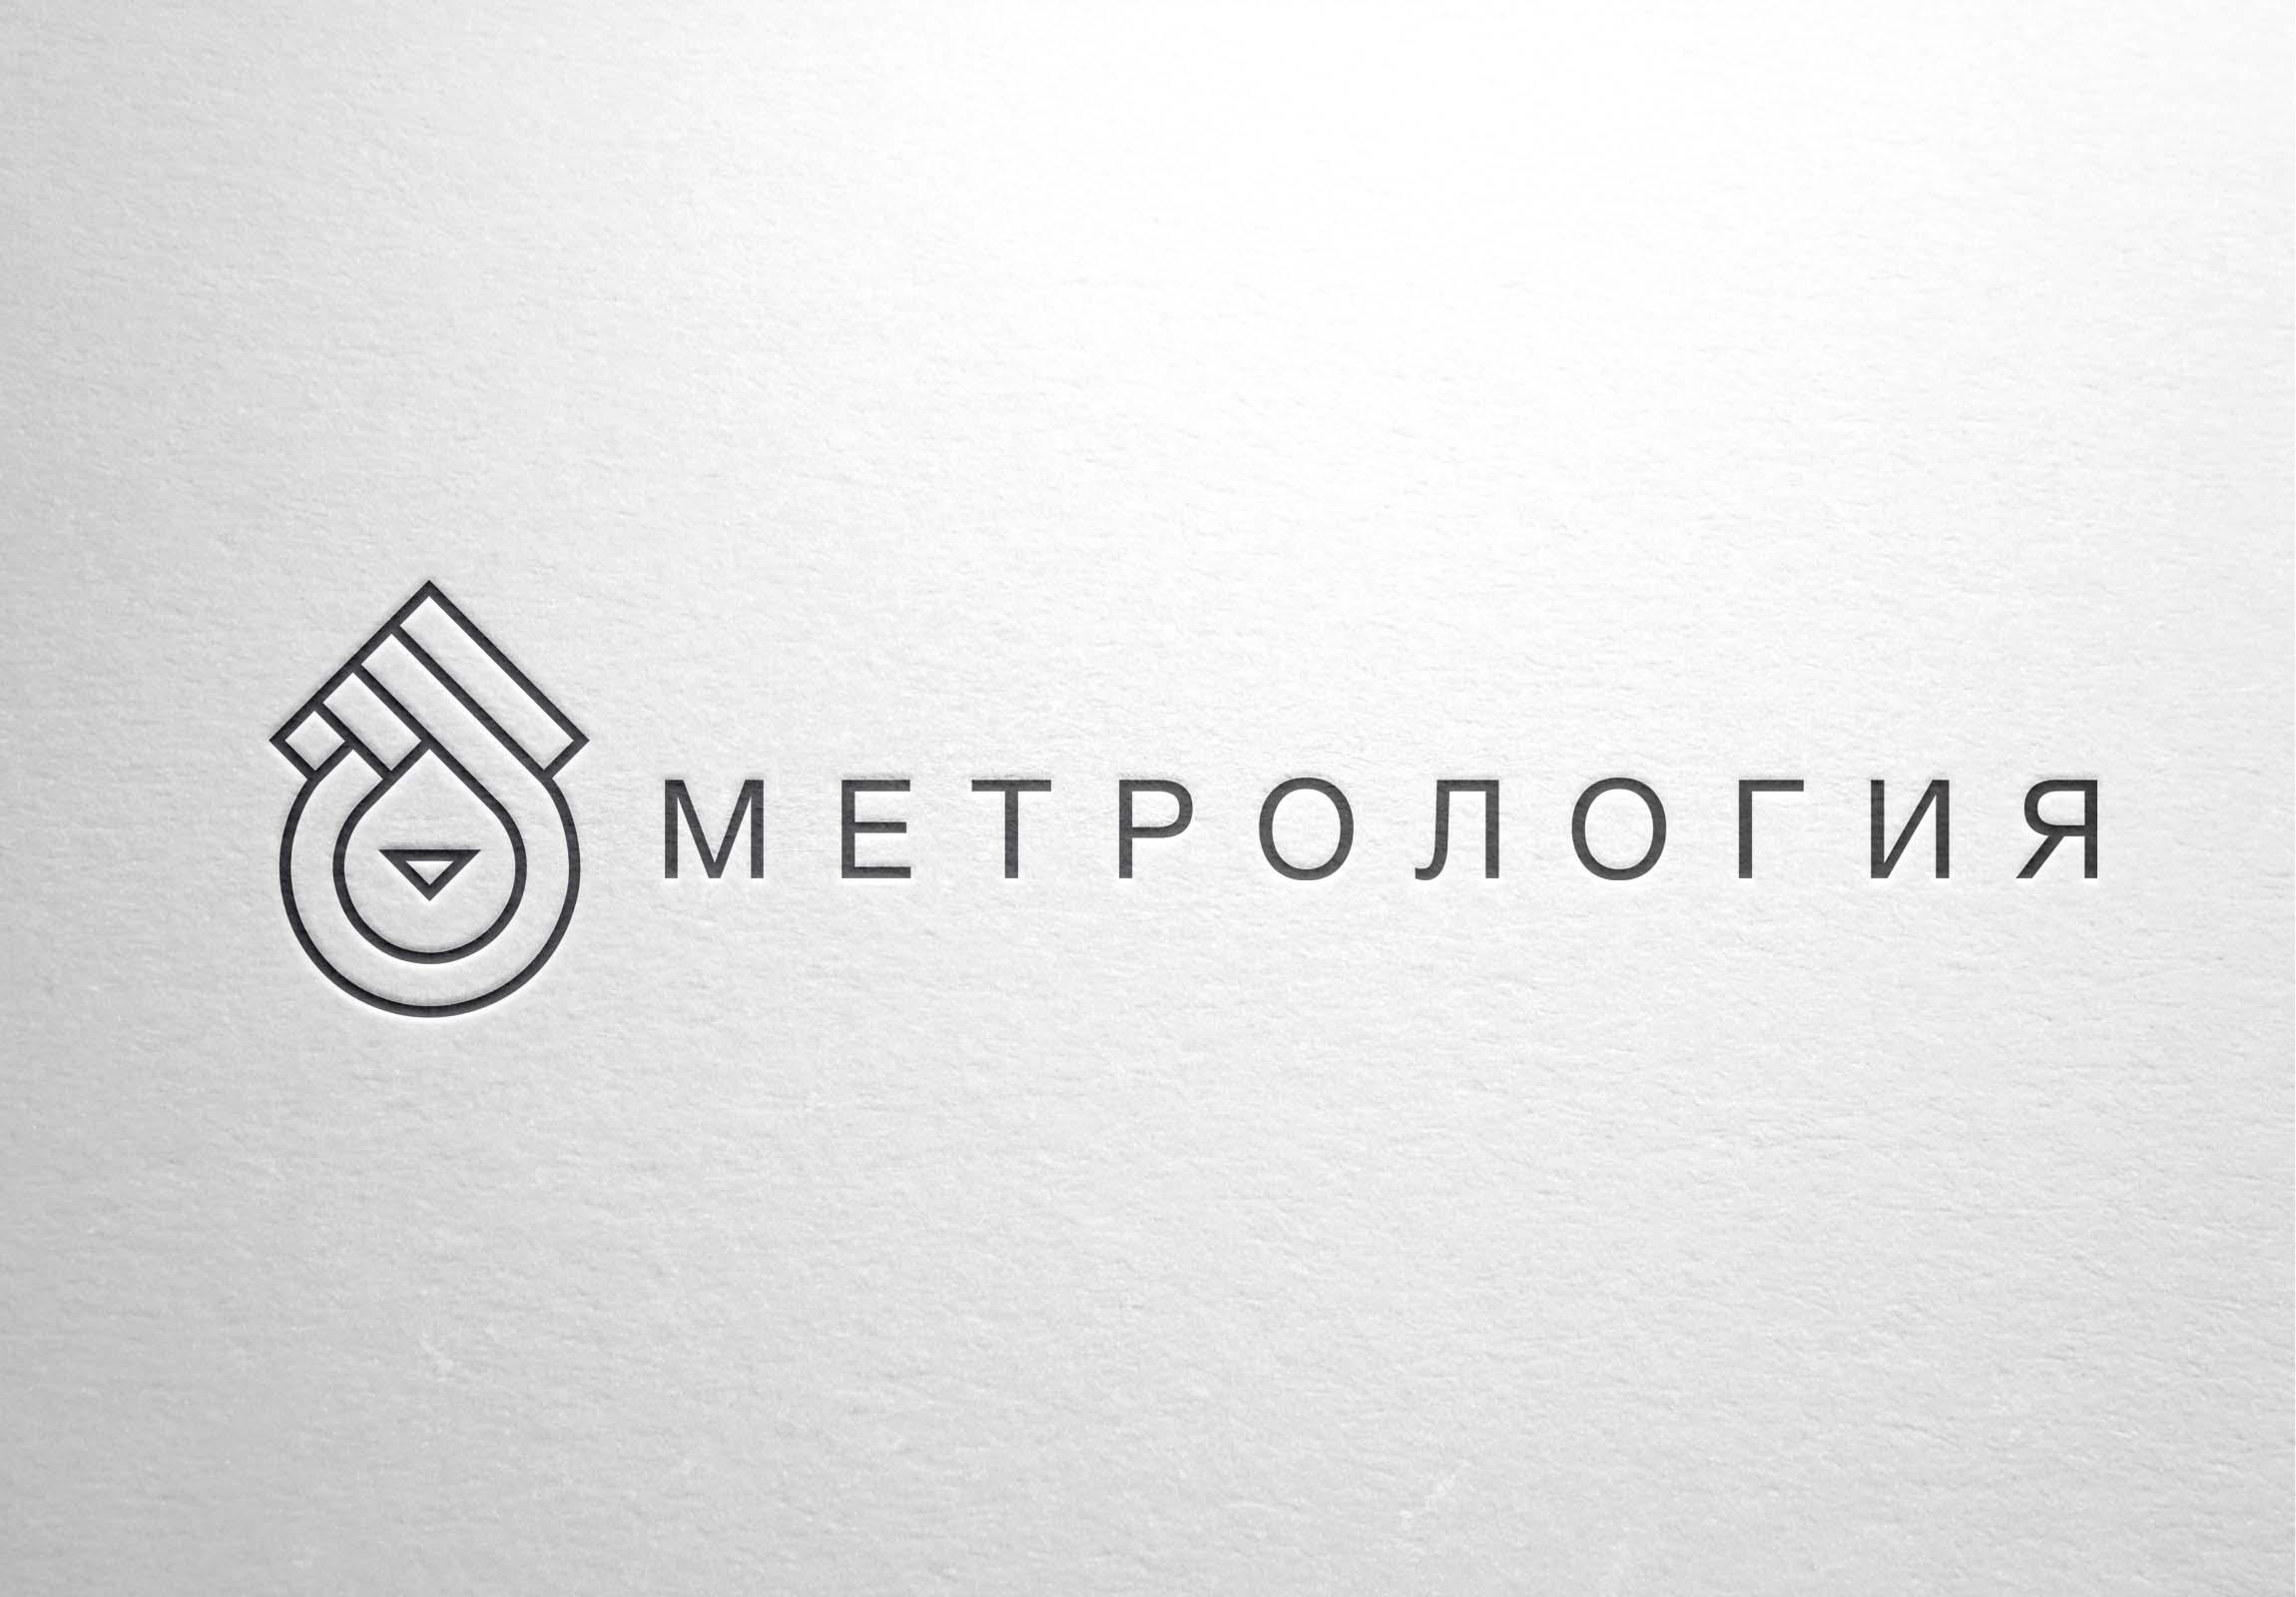 Разработать логотип, визитку, фирменный бланк. фото f_57958f8c7fcb289e.jpg